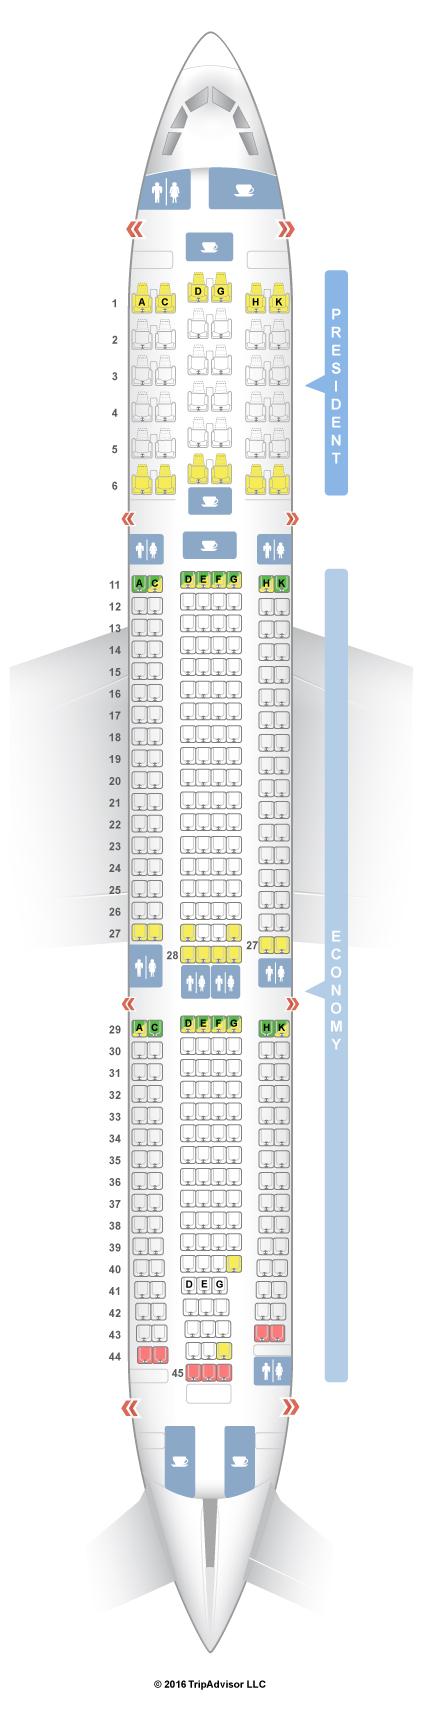 Airbus A330-300 Seat Map SeatGuru Seat Map Aeroflot   SeatGuru